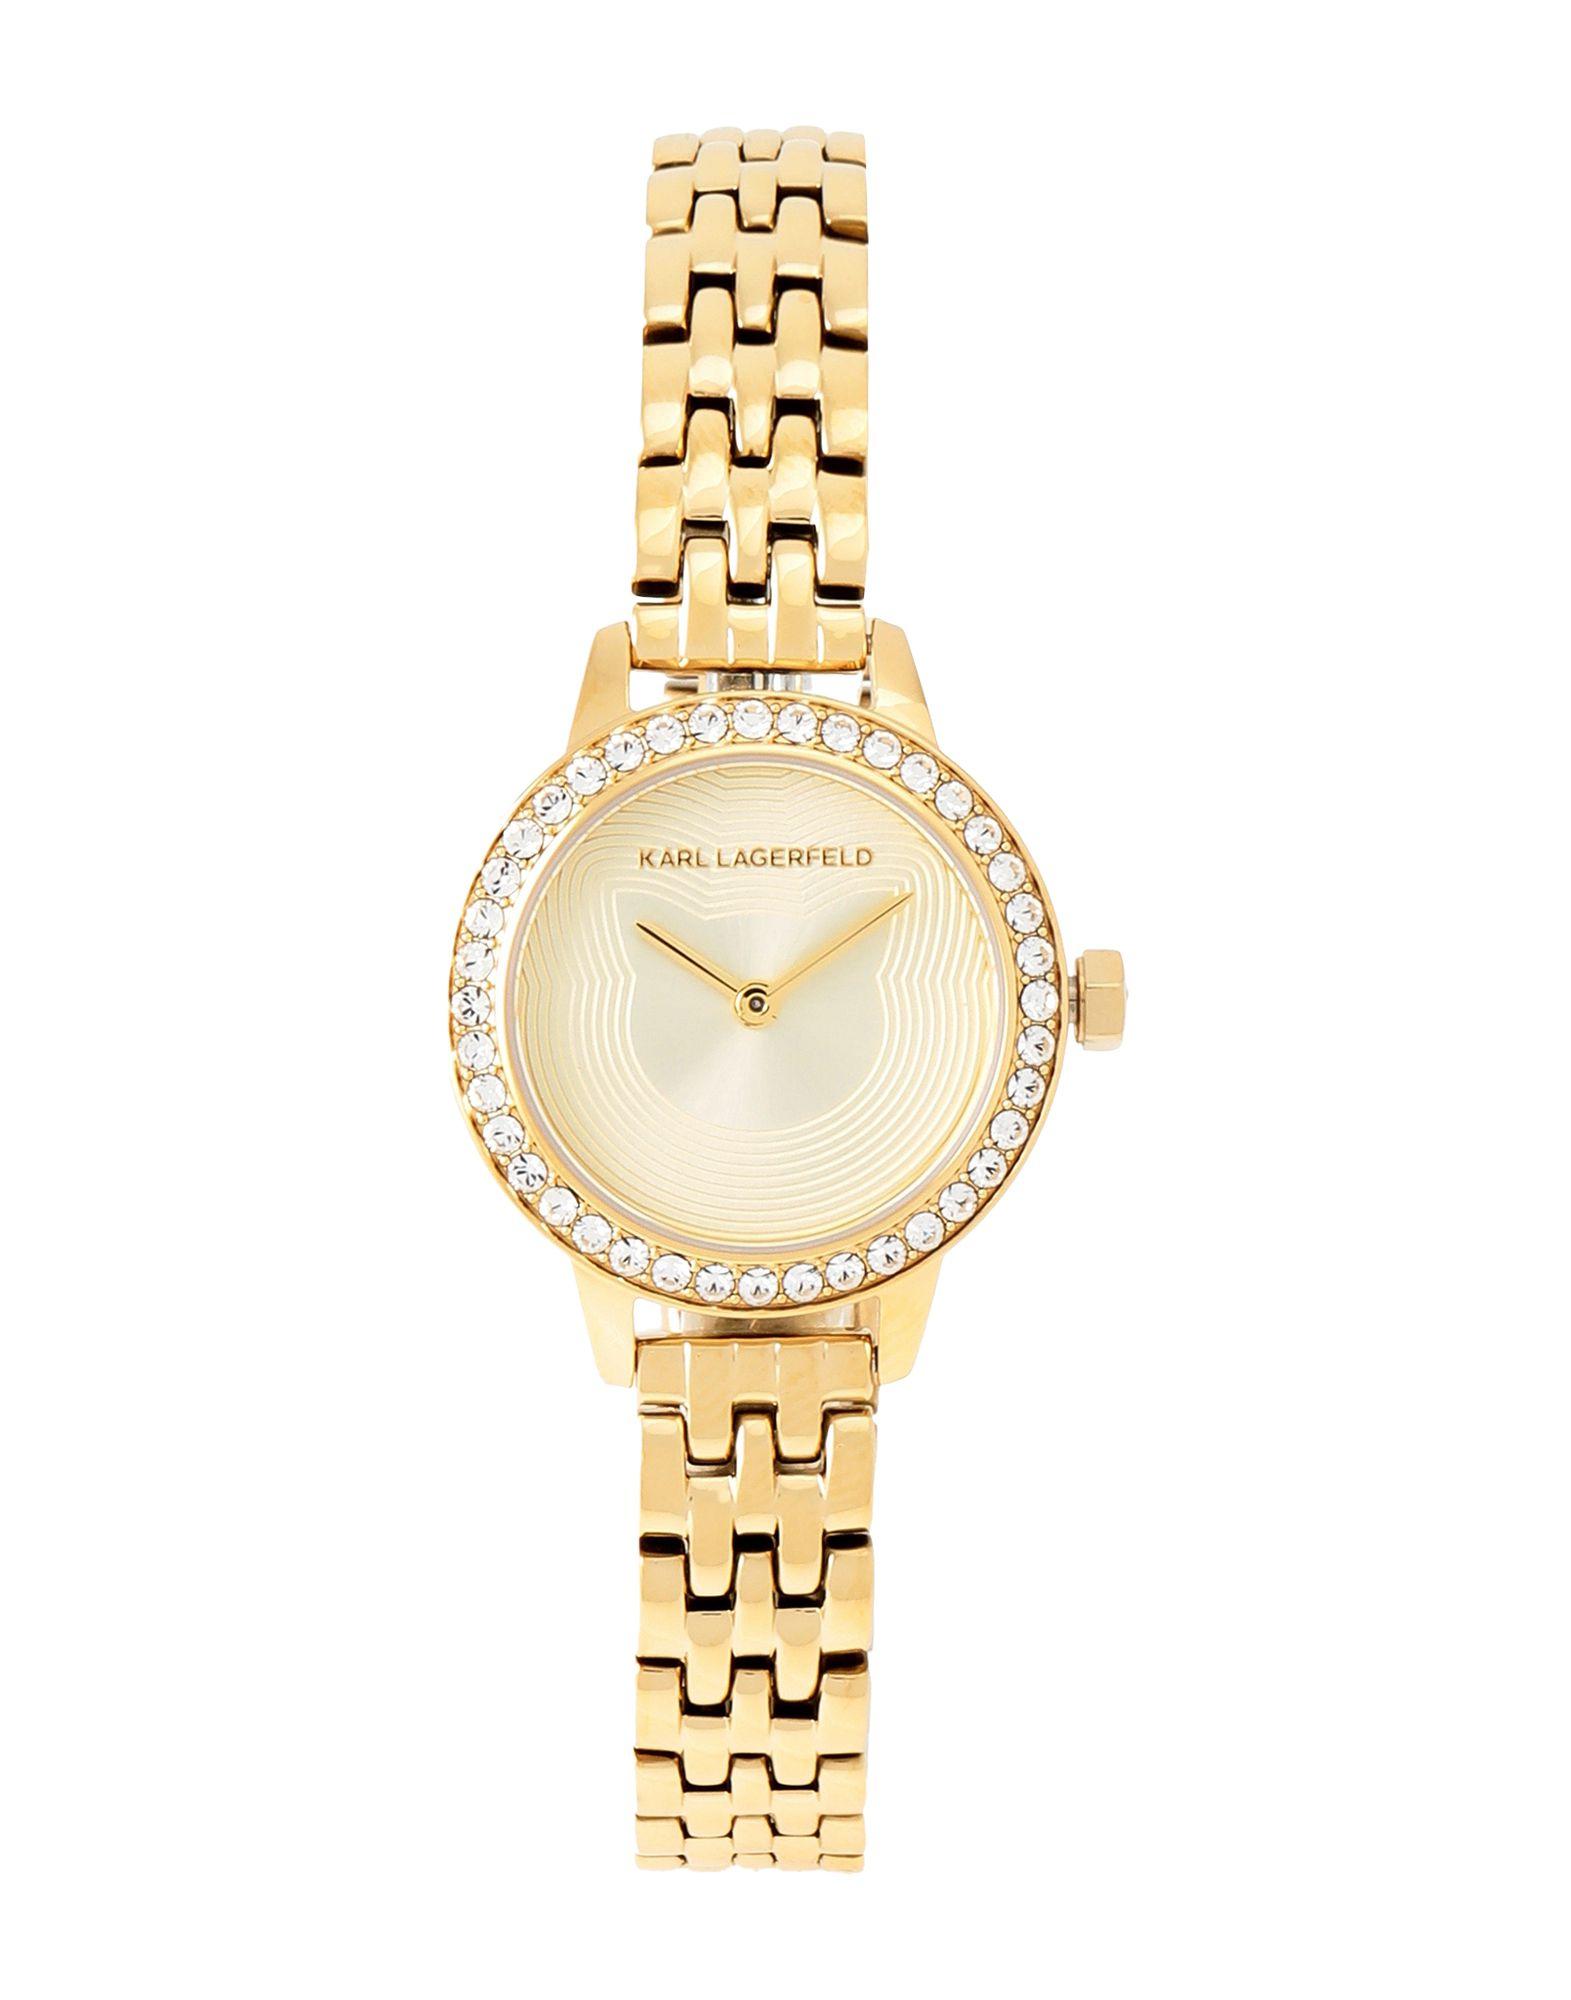 KARL LAGERFELD Wrist watches - Item 58050416